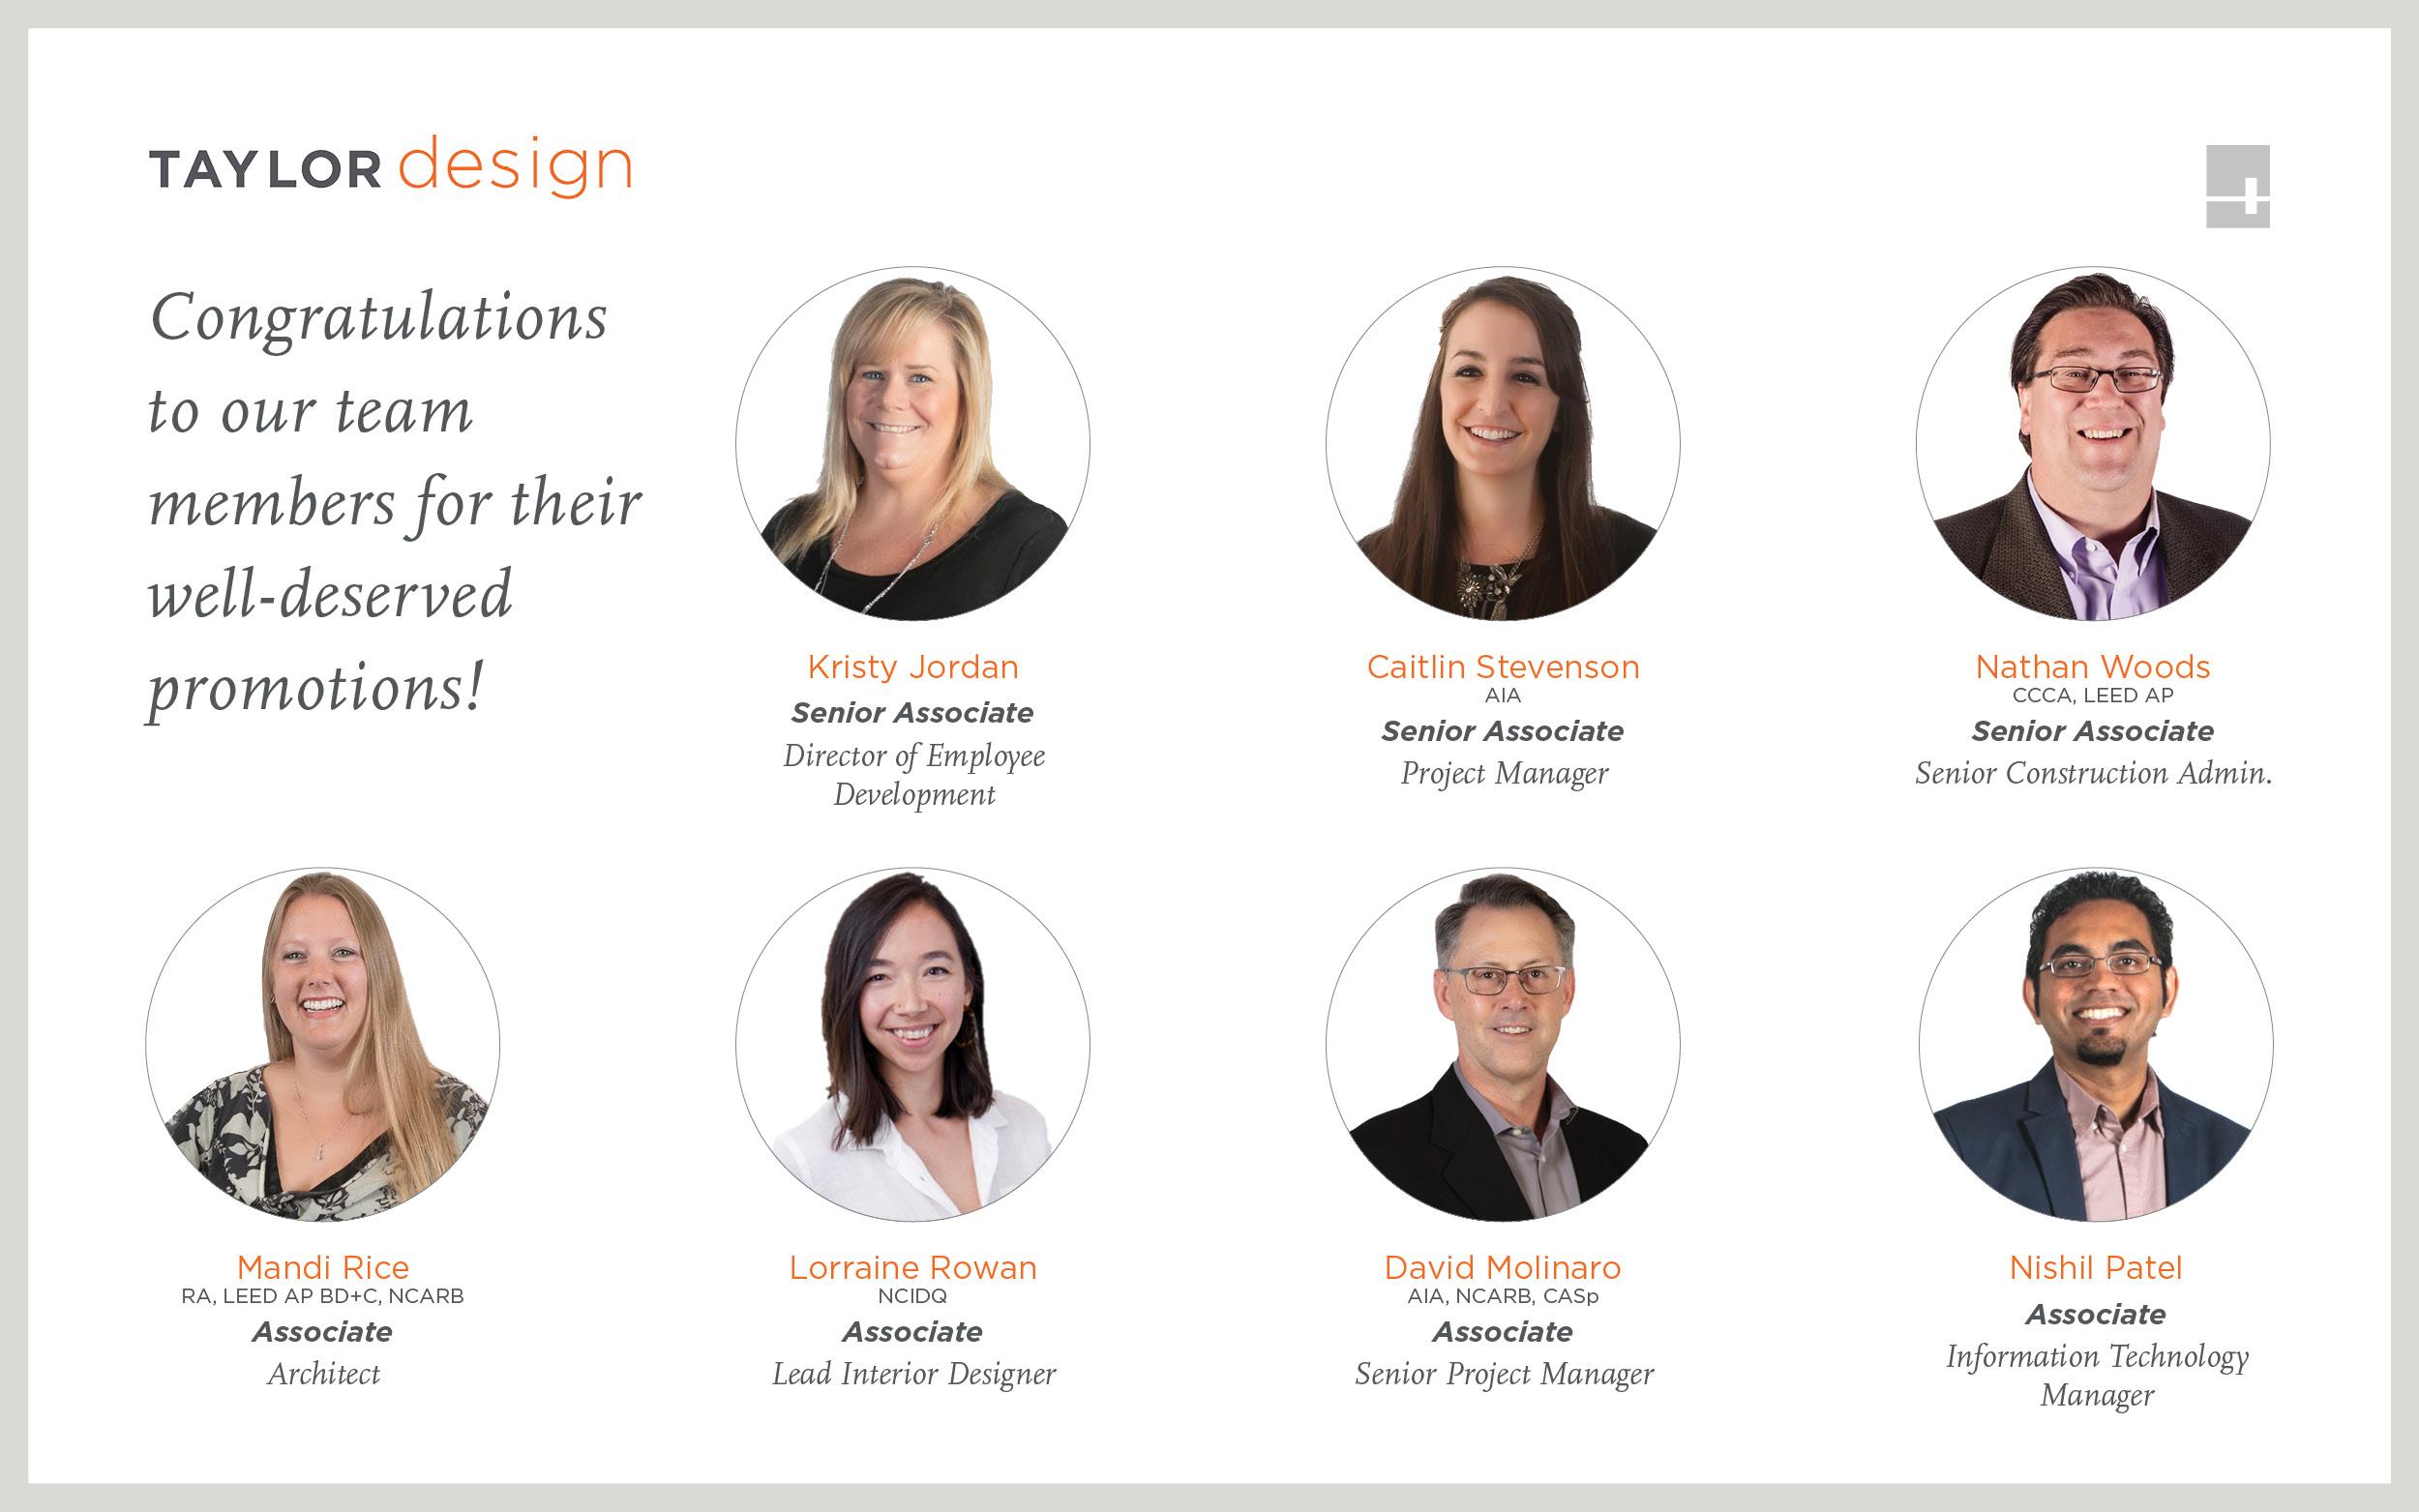 Taylor Design 2020 Promotions